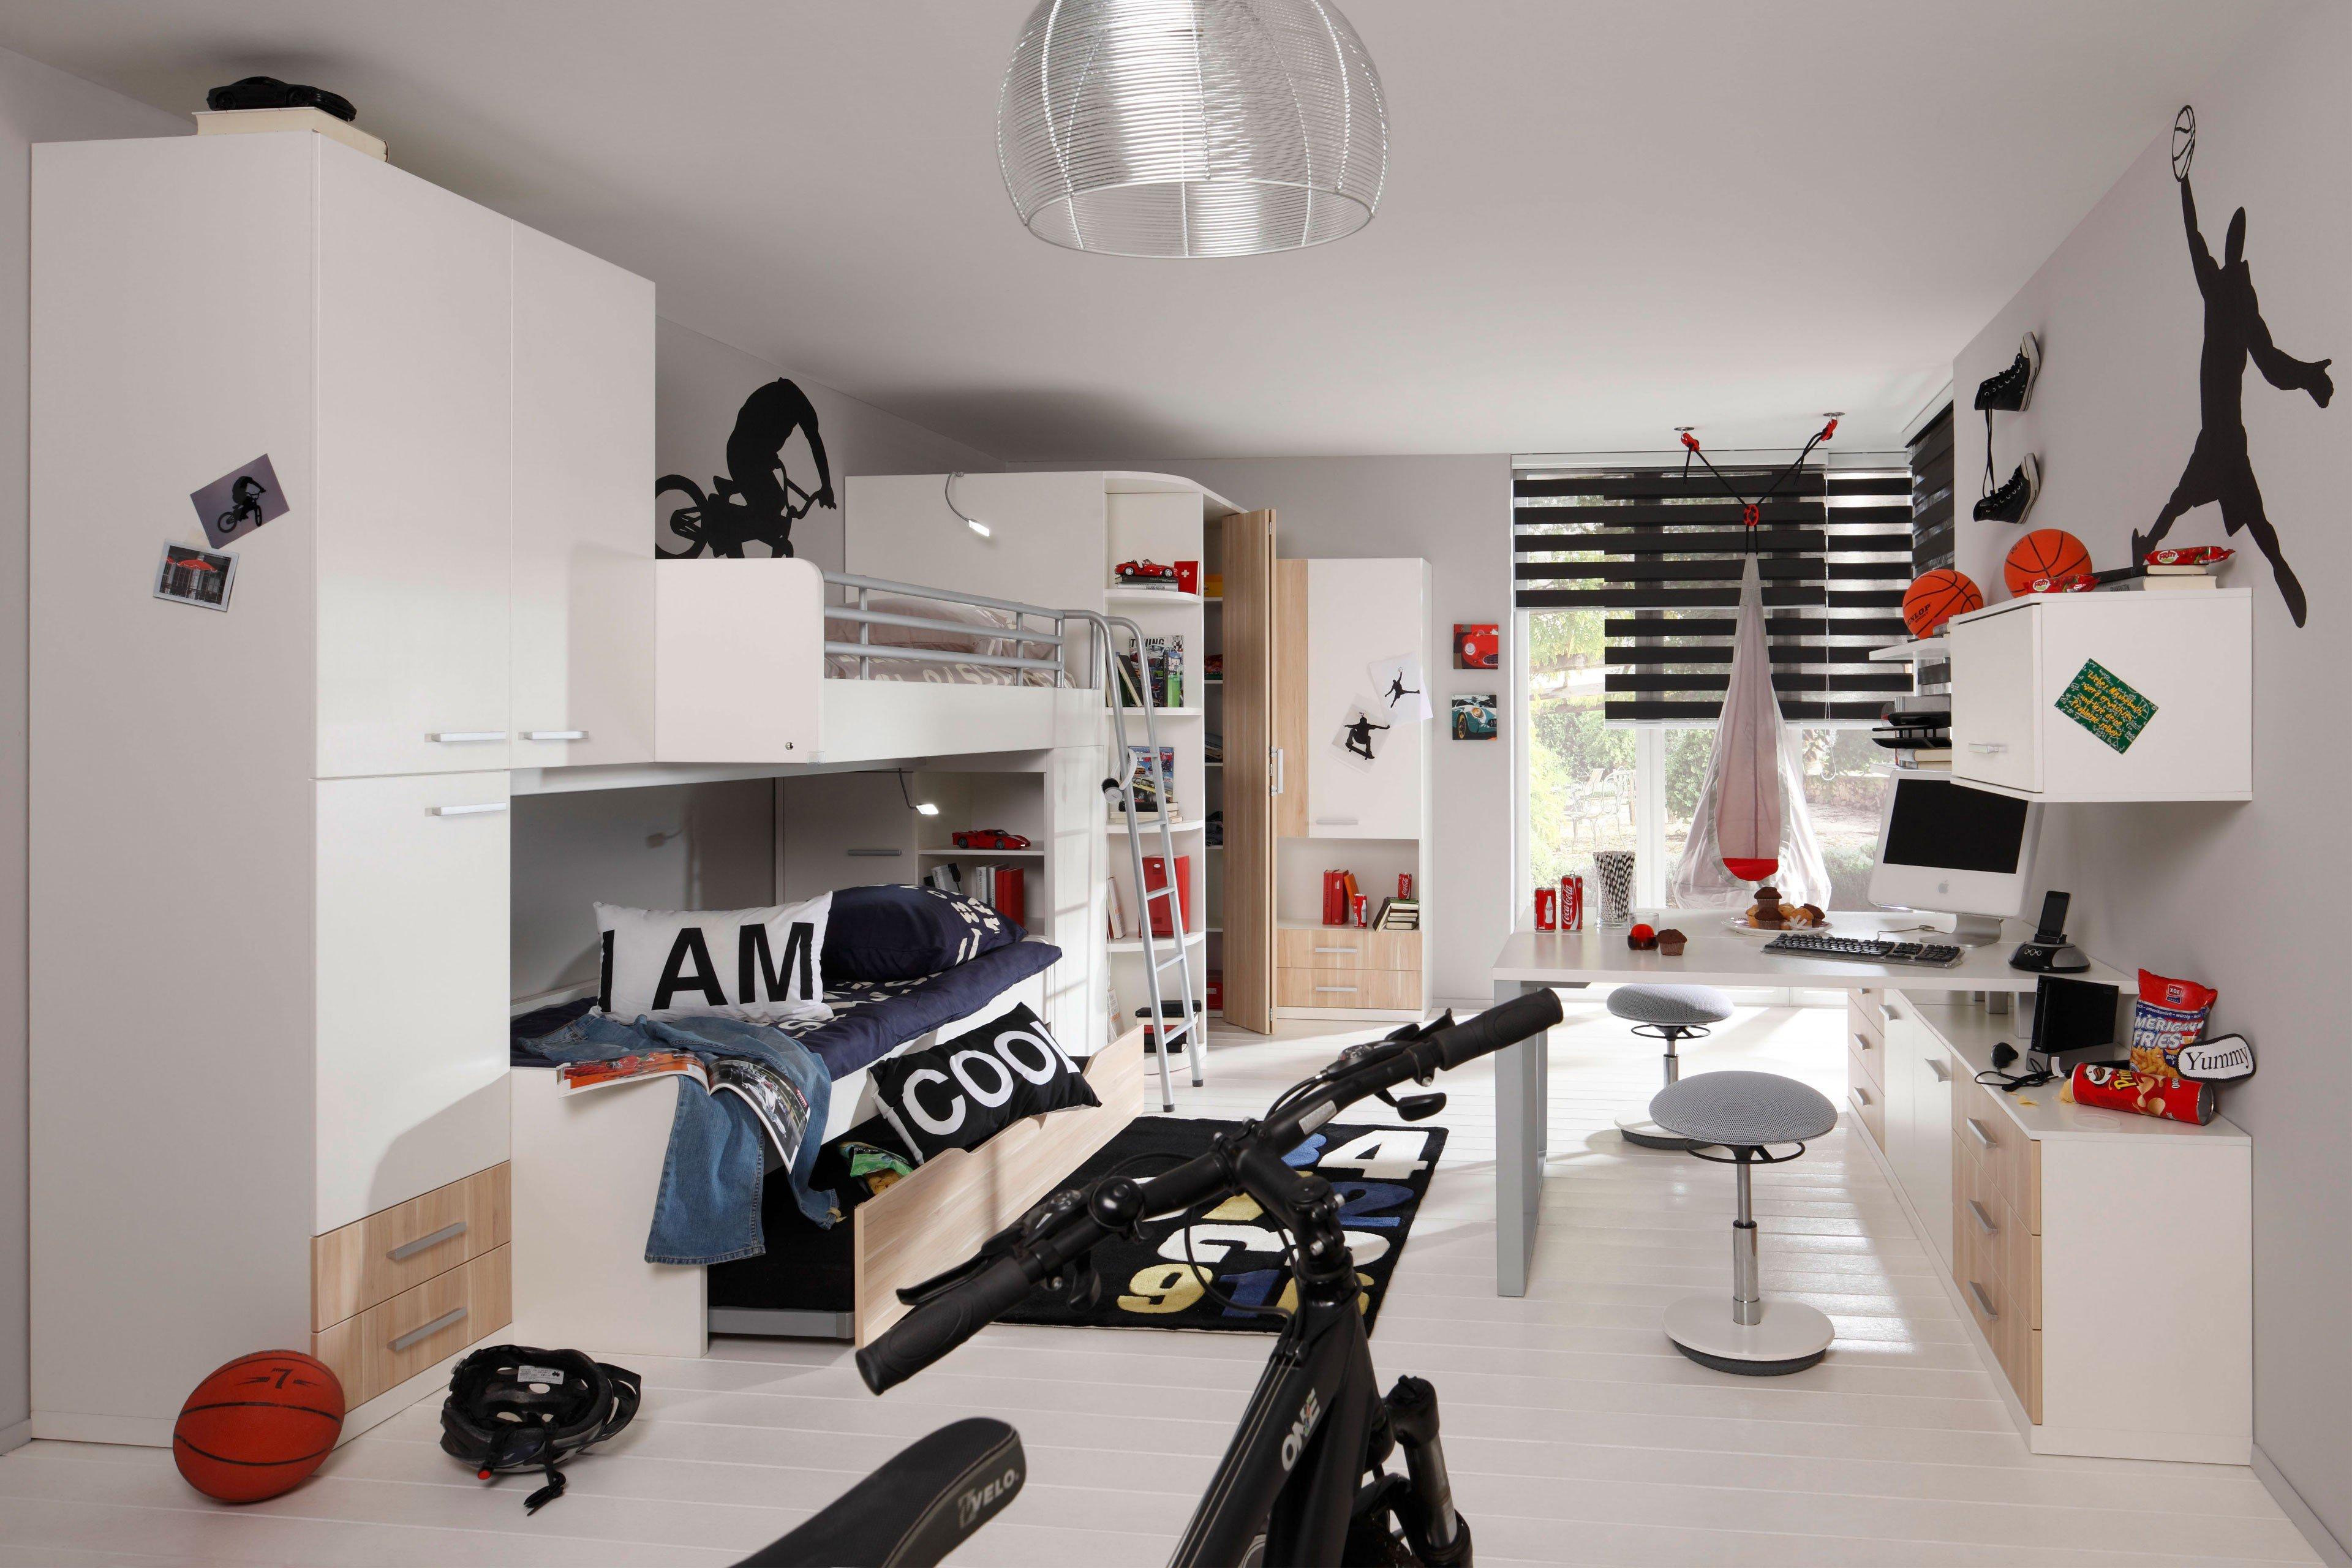 prenneis jugendzimmer hochbett e t two plus wei m bel. Black Bedroom Furniture Sets. Home Design Ideas